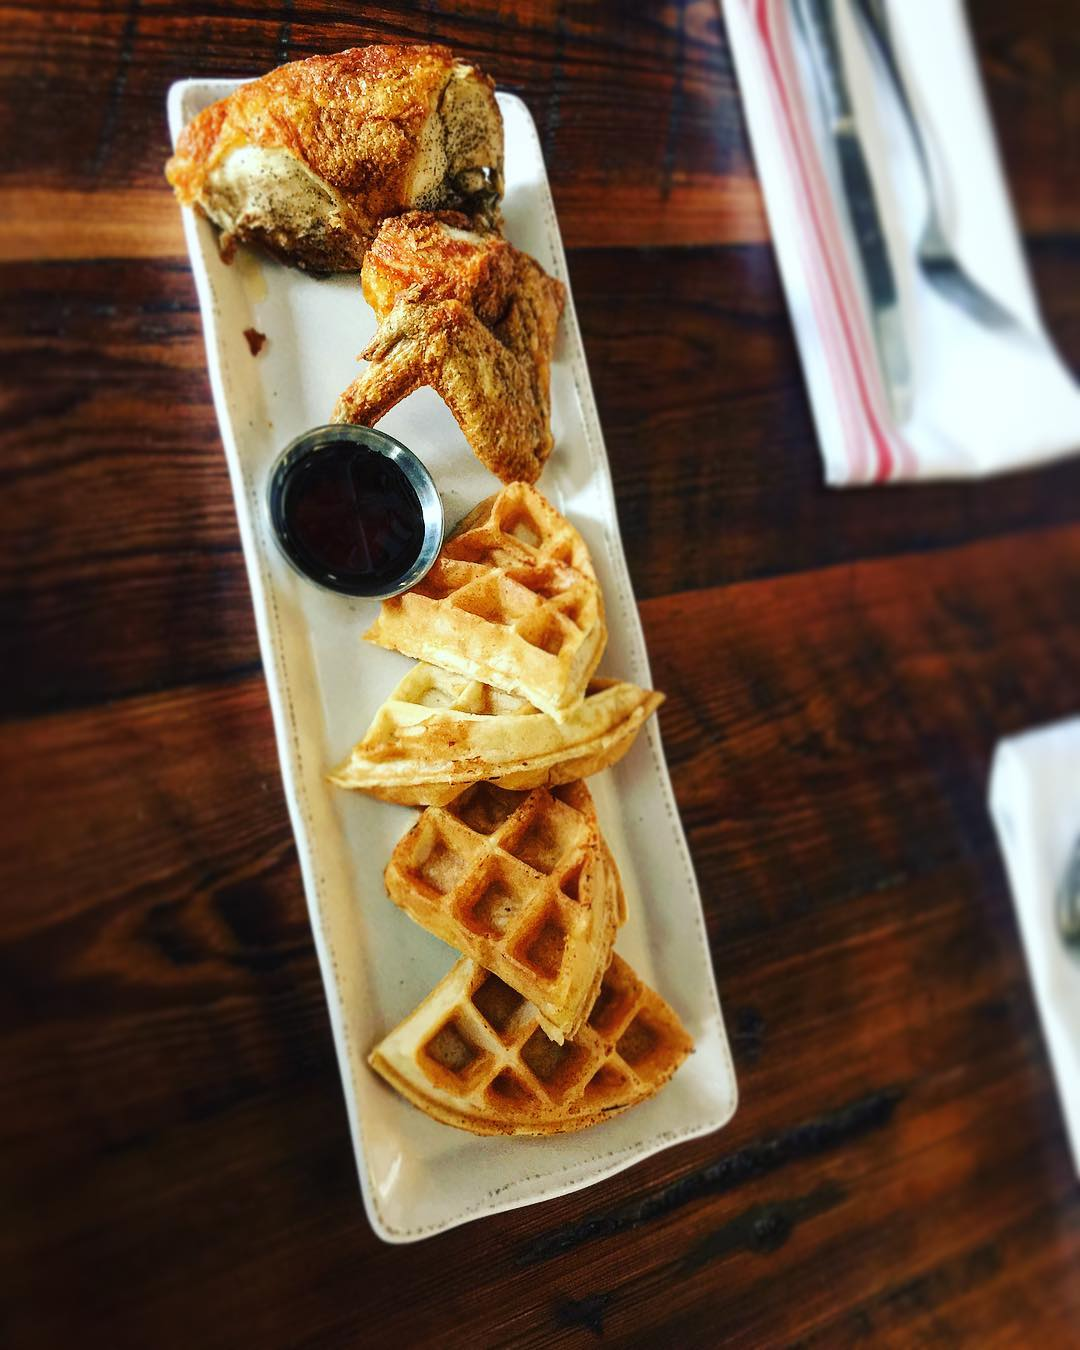 Chicken + Waffles, kids. This week through next week. Get…